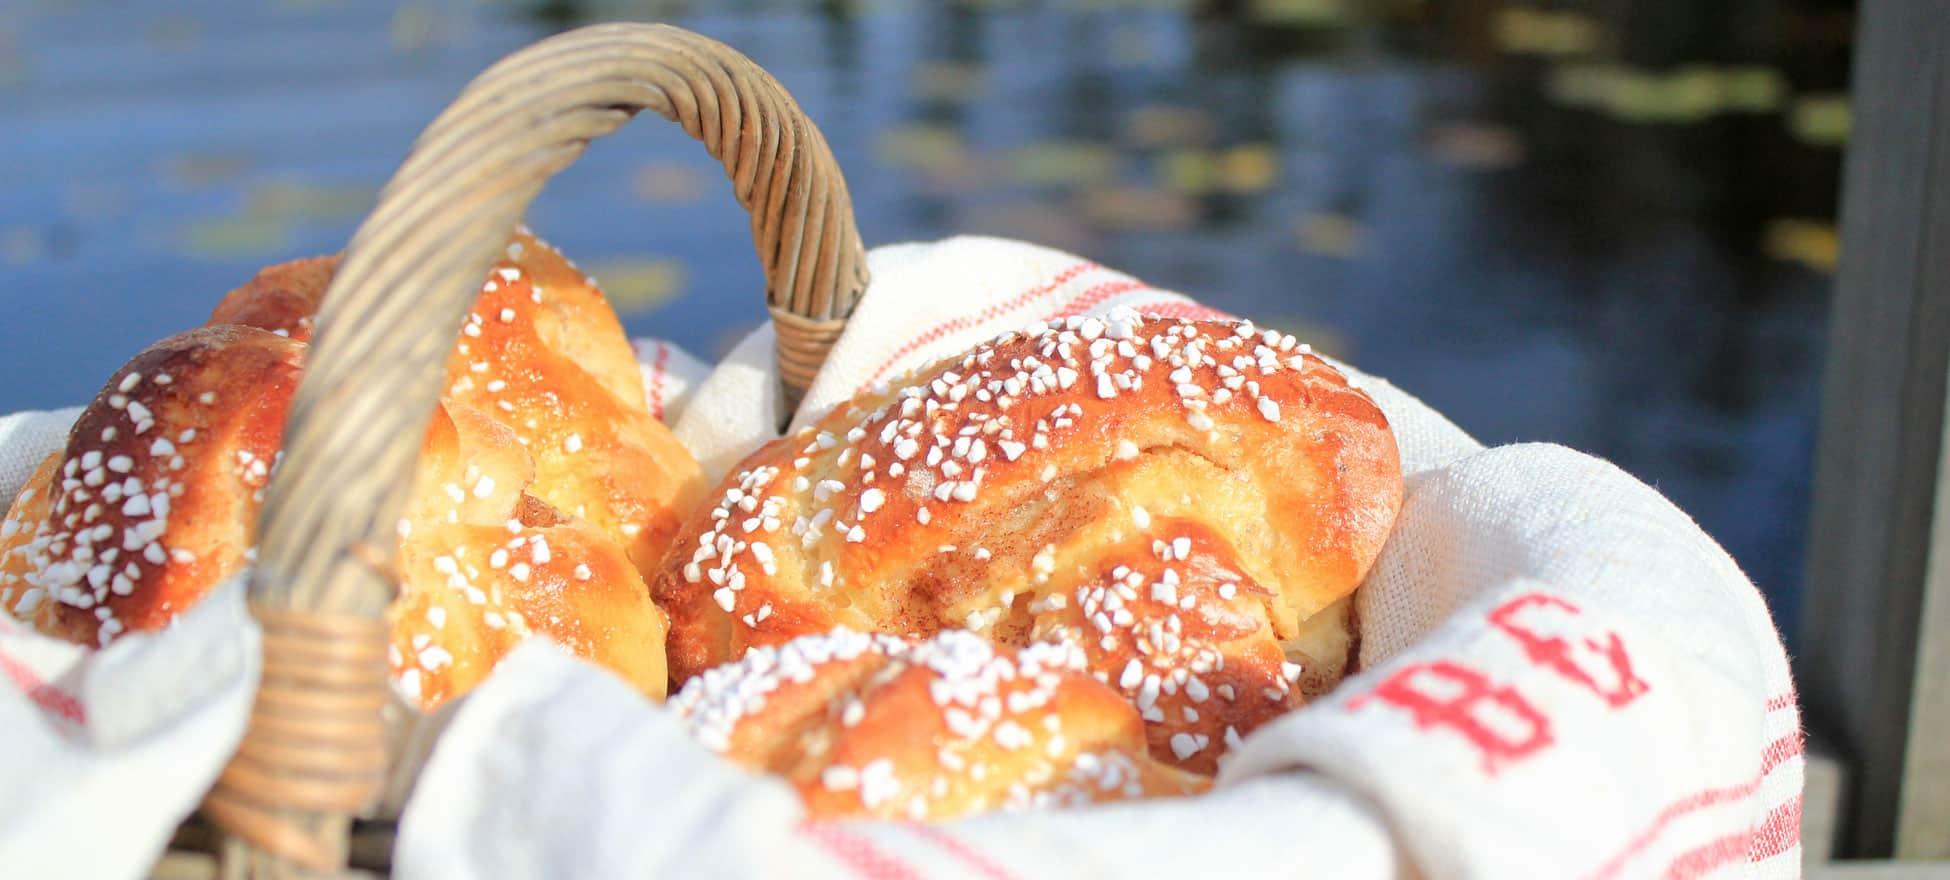 Zweedse kaneelbroodjes